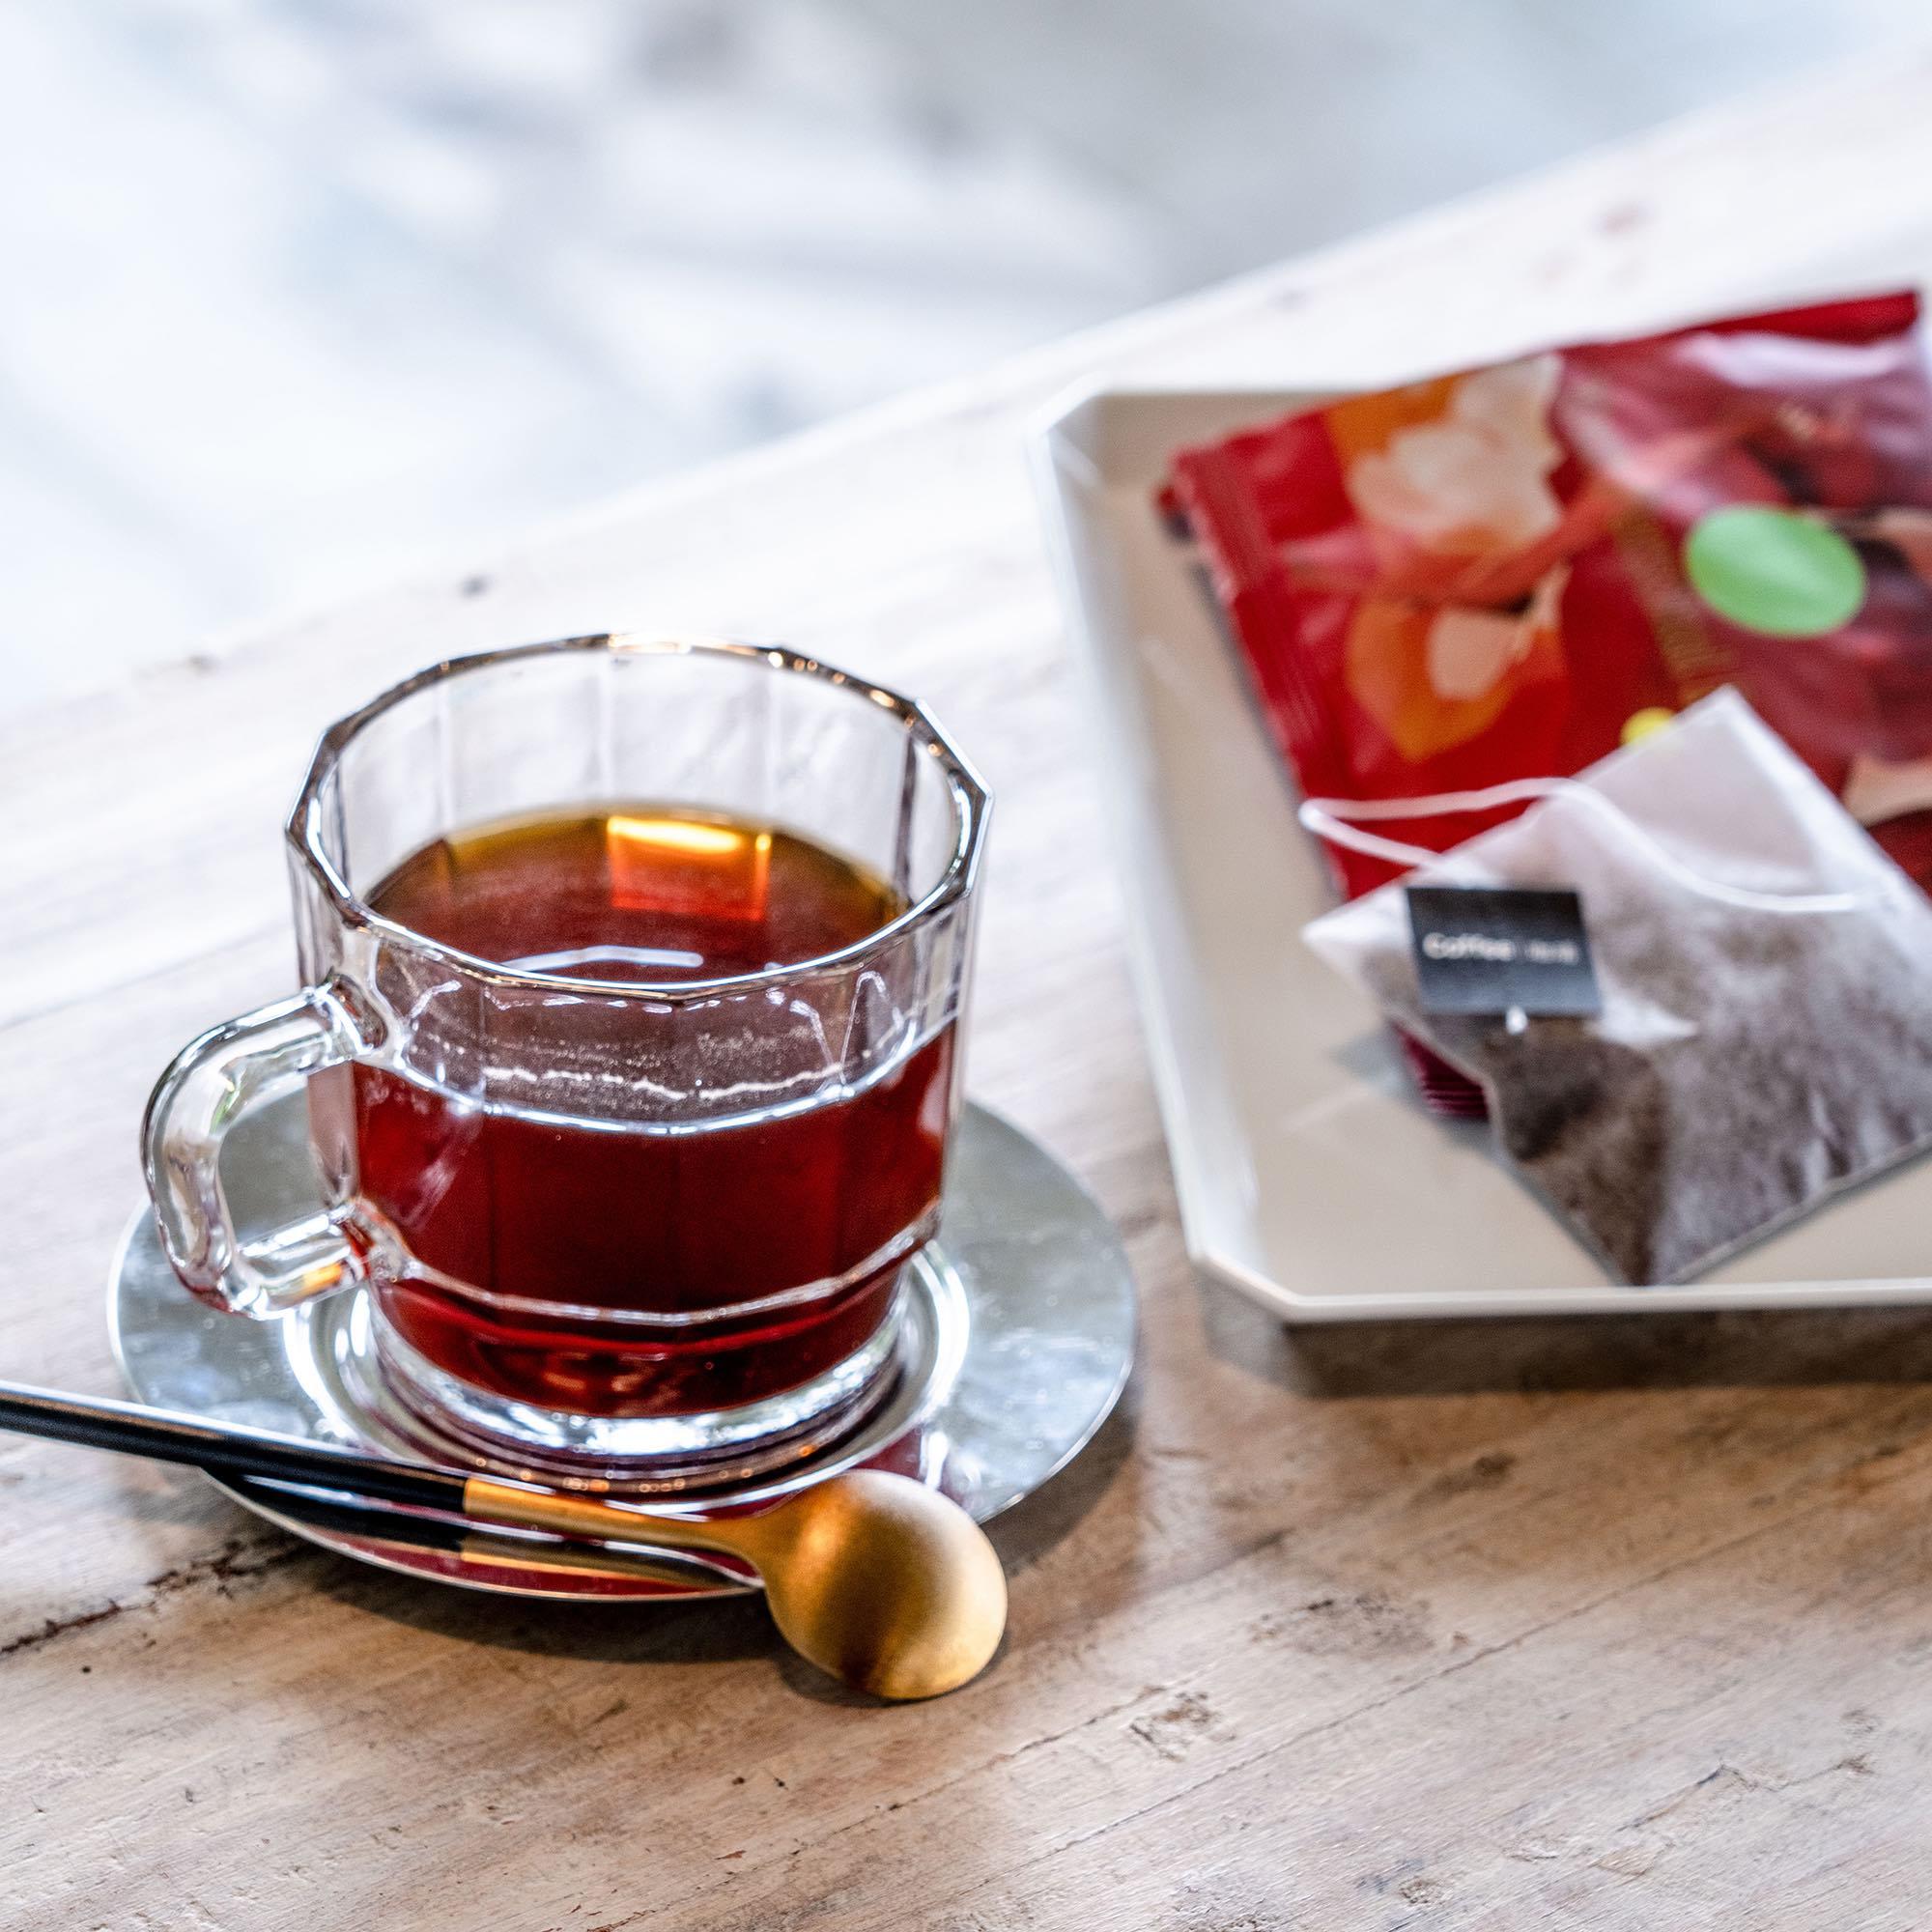 BEMO Café 浸泡系列 / 哥斯大黎加‧音樂家系列‧莫札特 葡萄乾蜜處理(中淺焙)